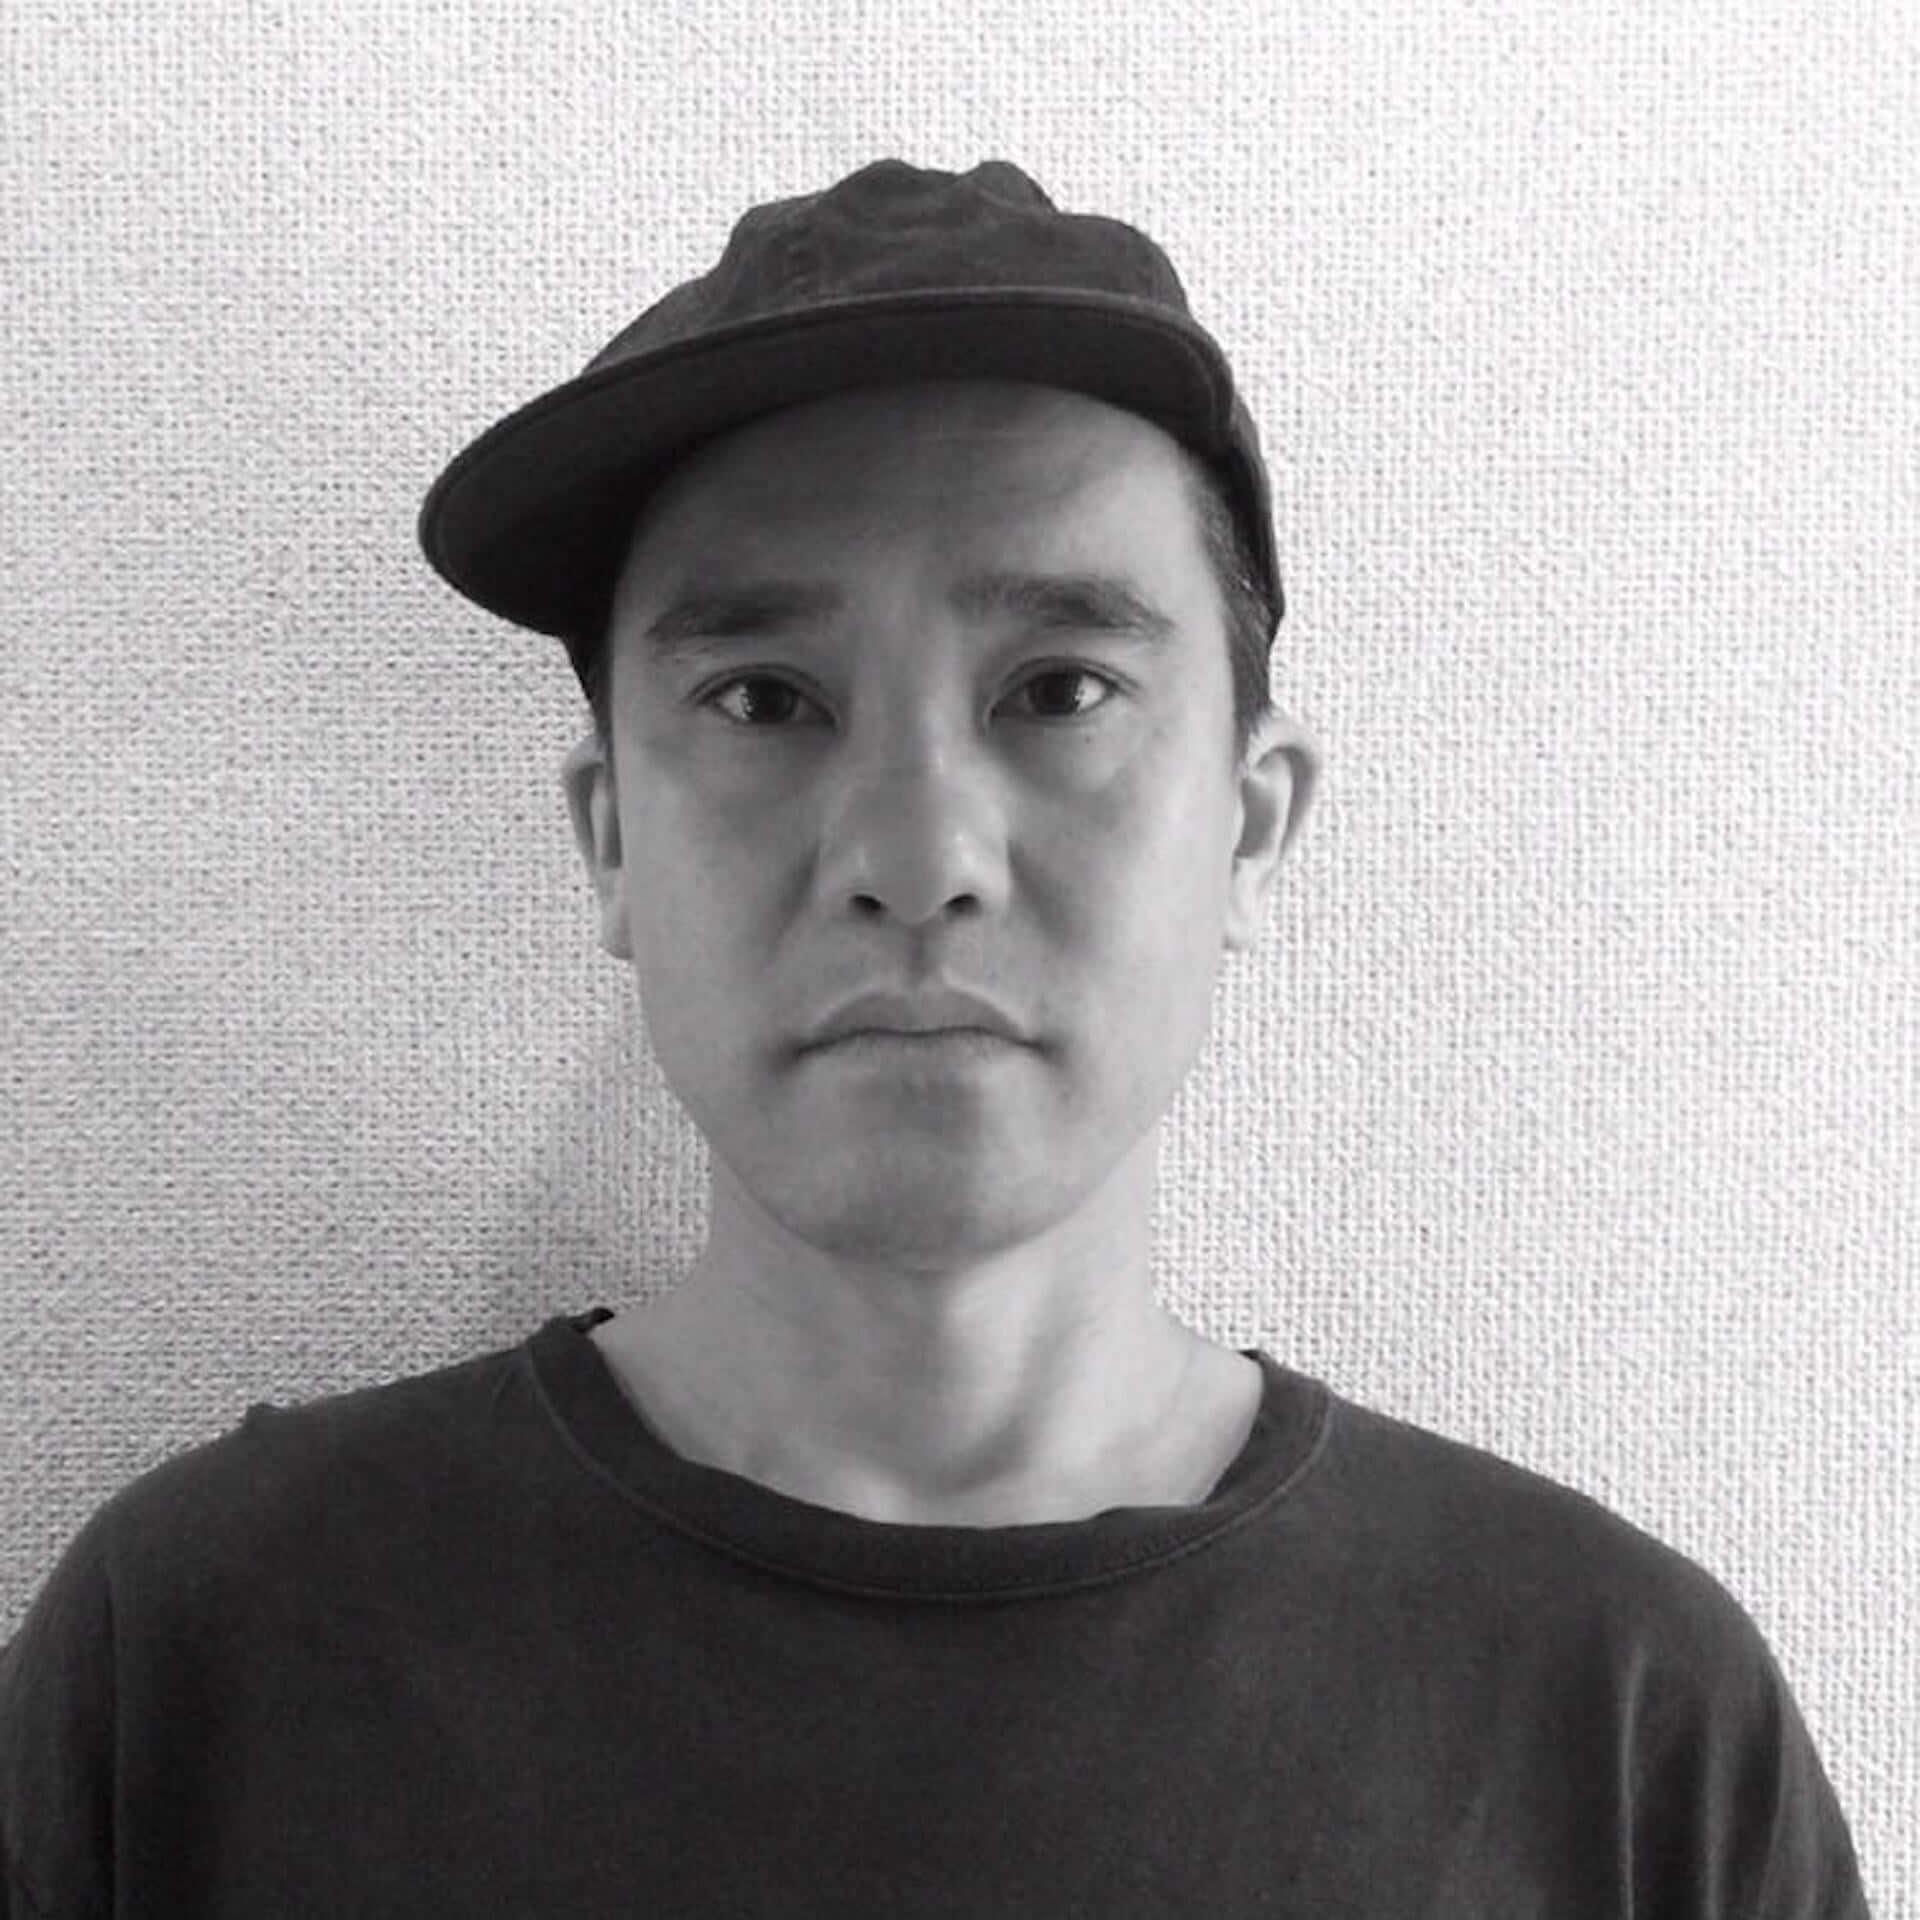 HARE×加賀美健の「TOKYO NONSENSE」第7弾コラボアイテムが販売決定!『勝負パンツ』『猫背T』等10点がラインナップ lf200730_tokyo-nonsense_2-1920x1920